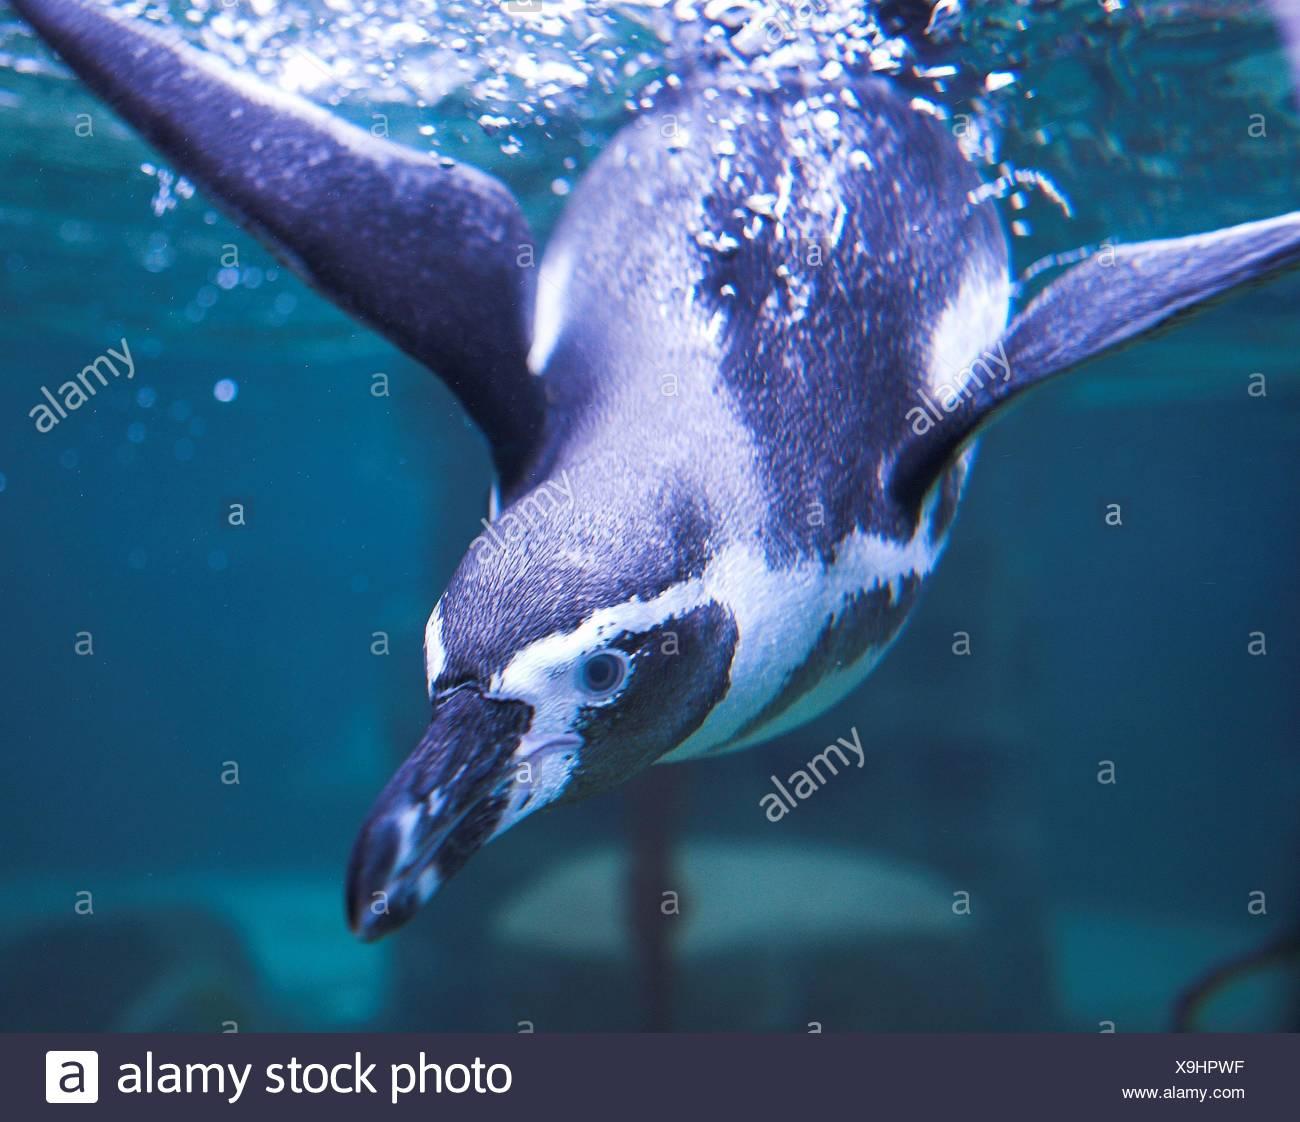 penguin - Stock Image